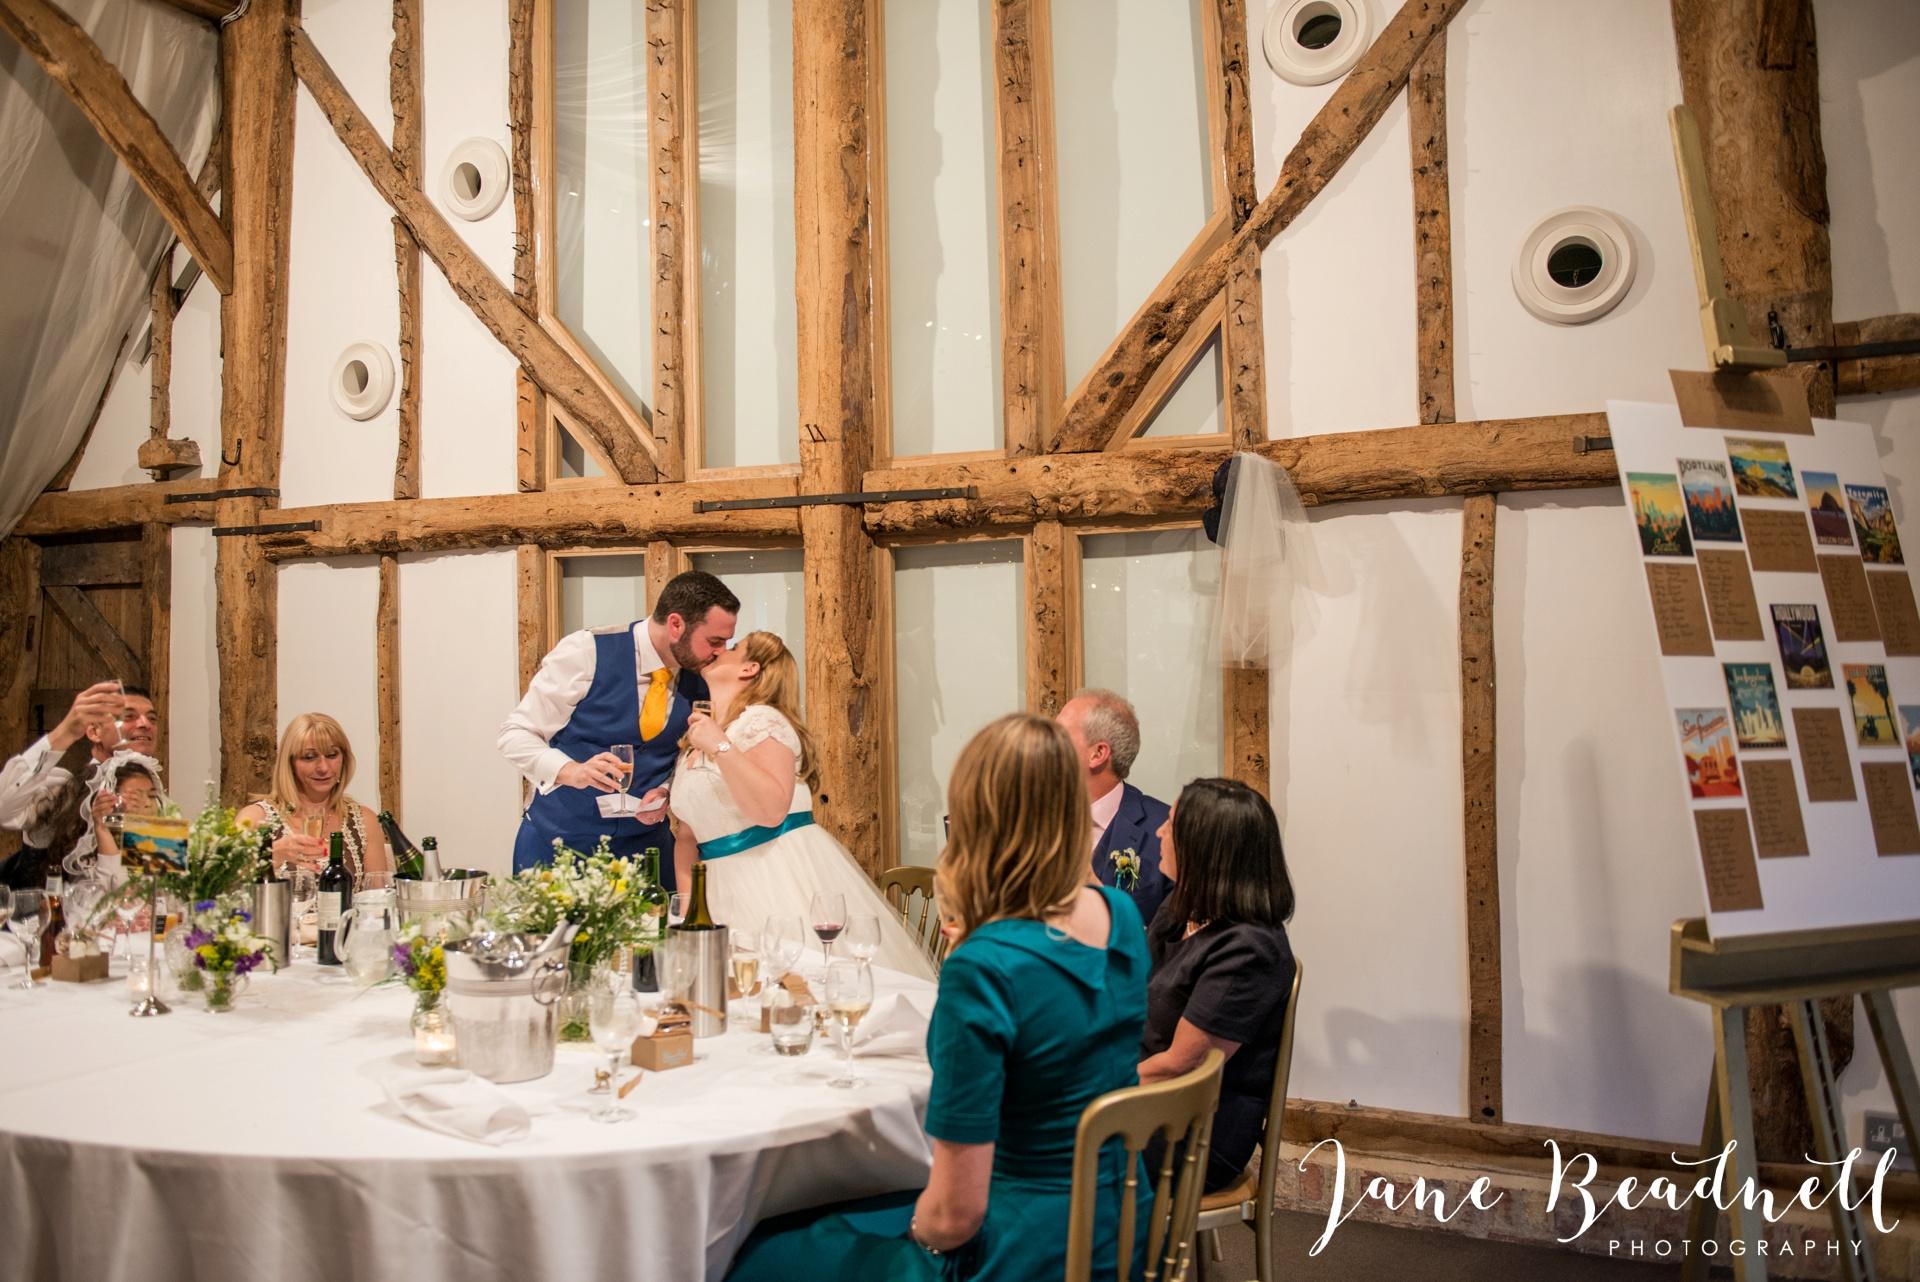 South Farm Wedding photography Hertfordshire by Jane Beadnell Photography fine art wedding photographer_0204